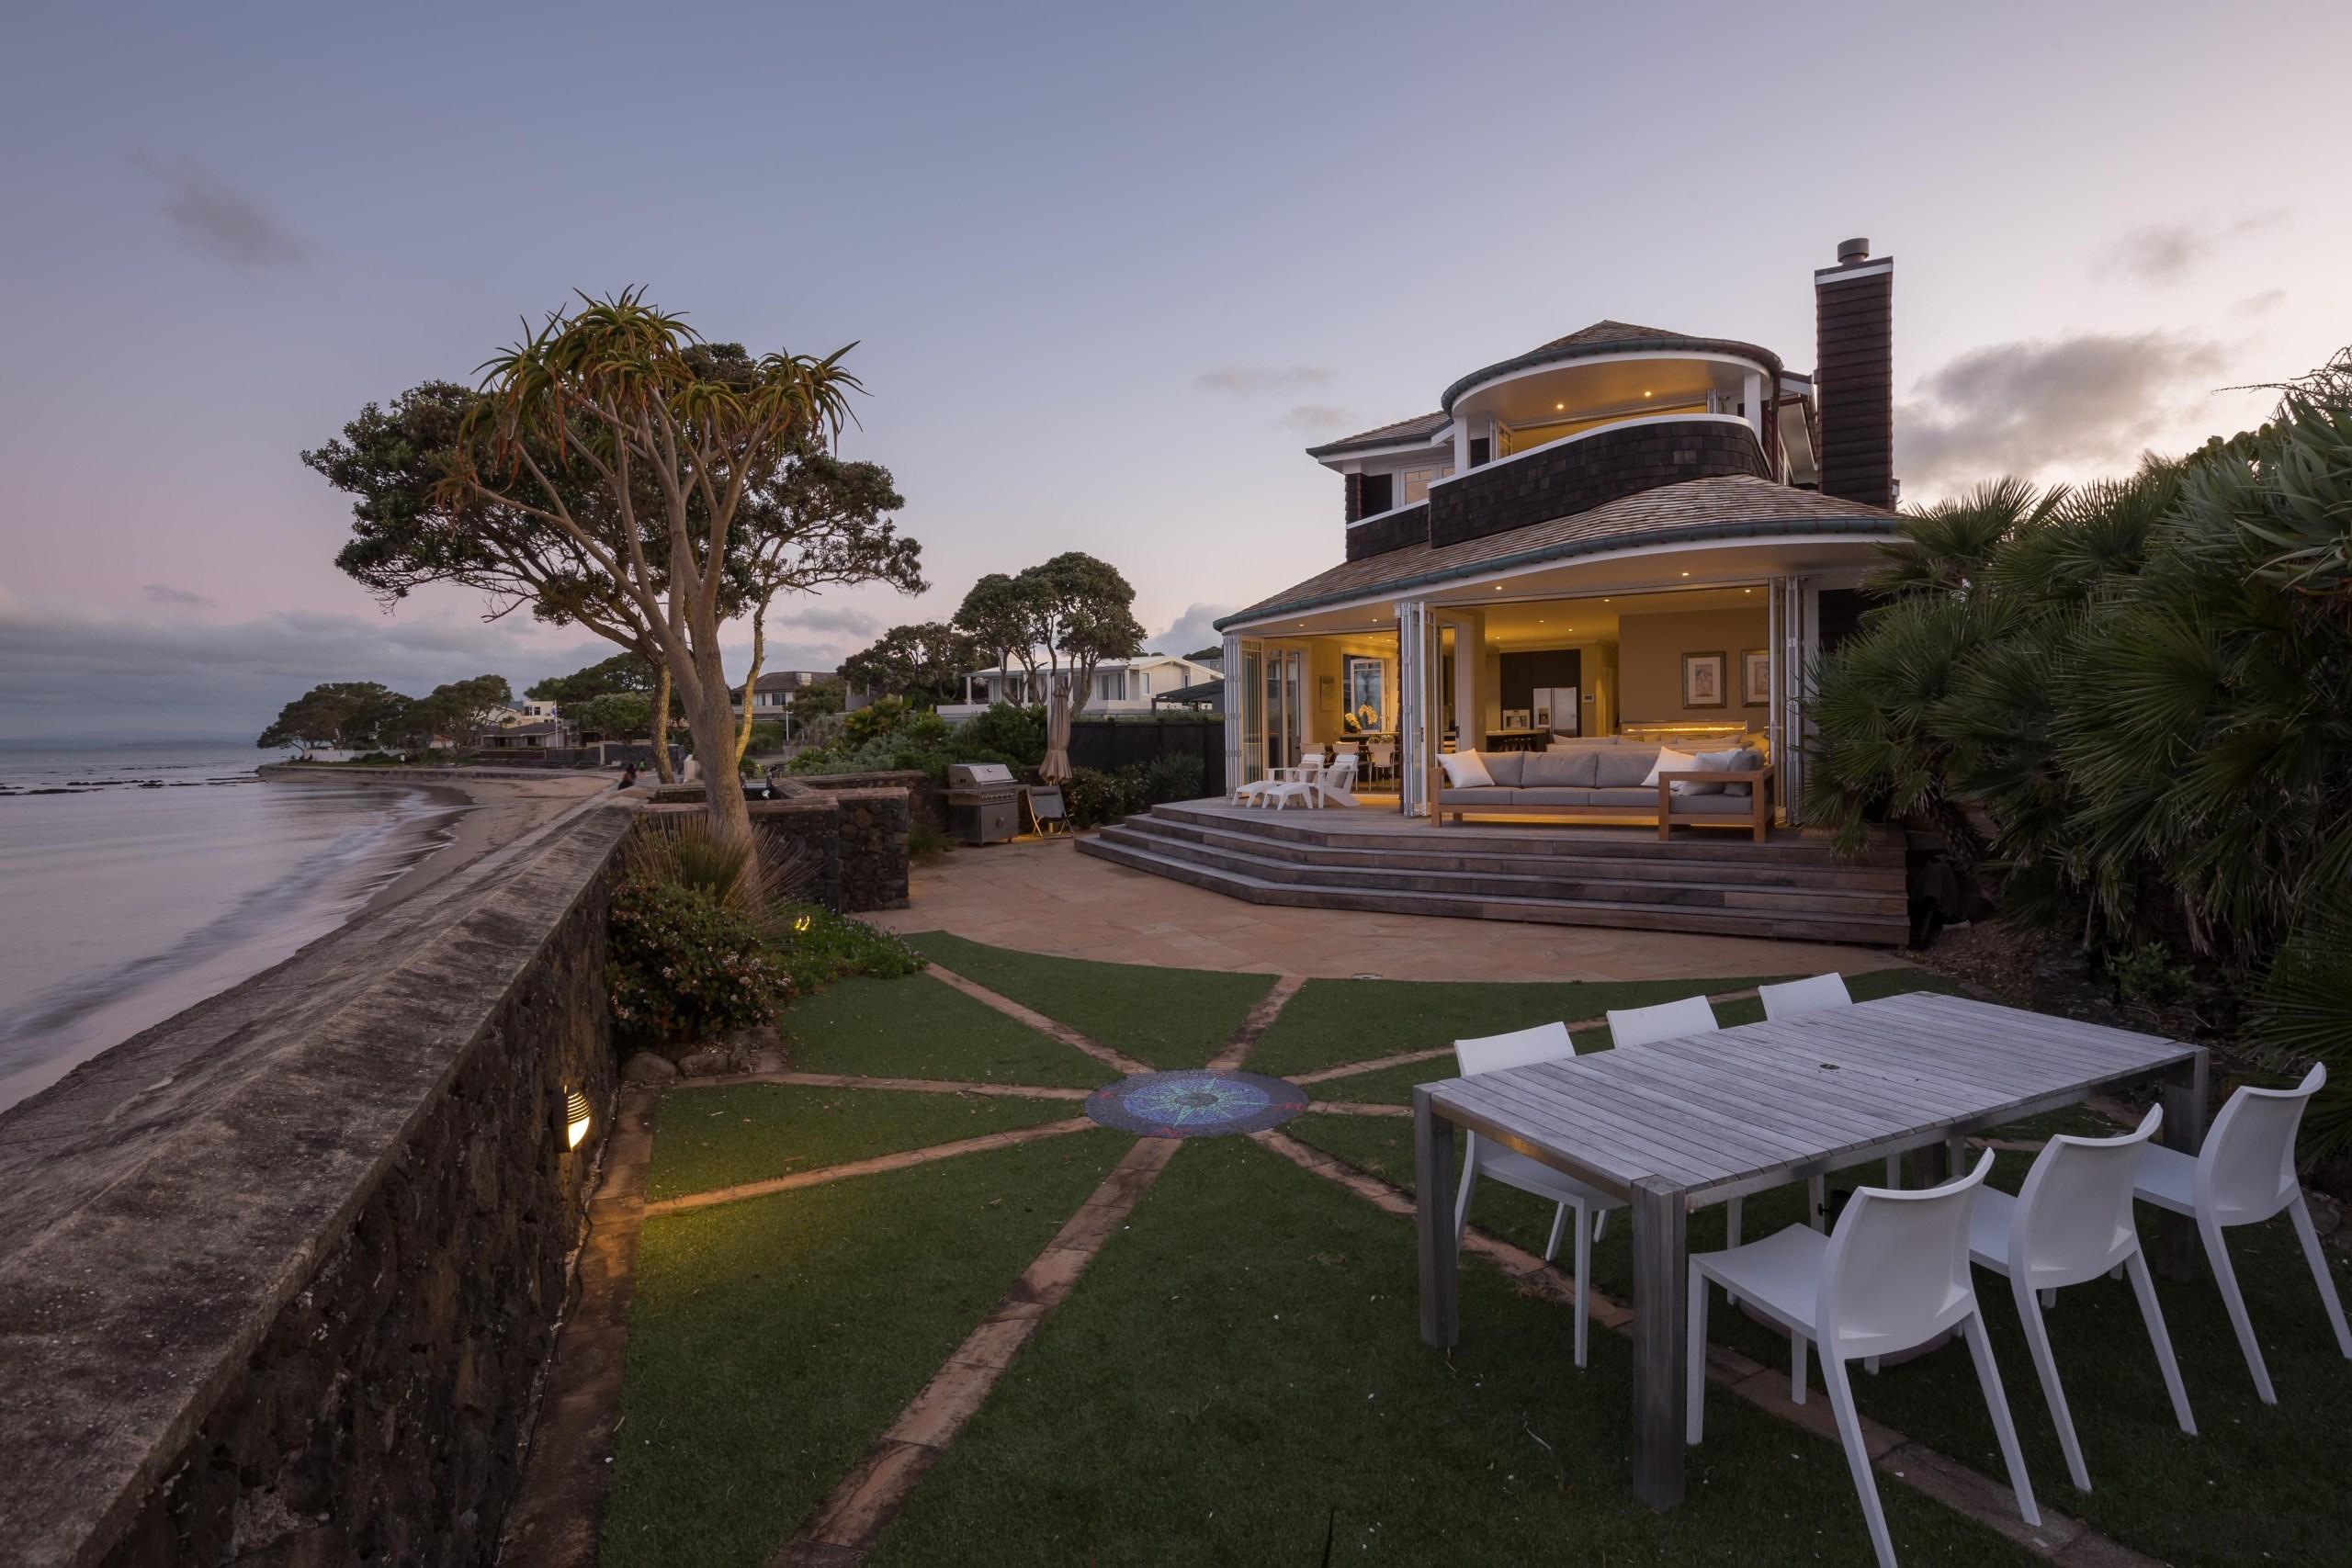 Img8988 - cottage | estate | home | cottage, estate, home, house, property, real estate, resort, sky, tree, villa, black, gray